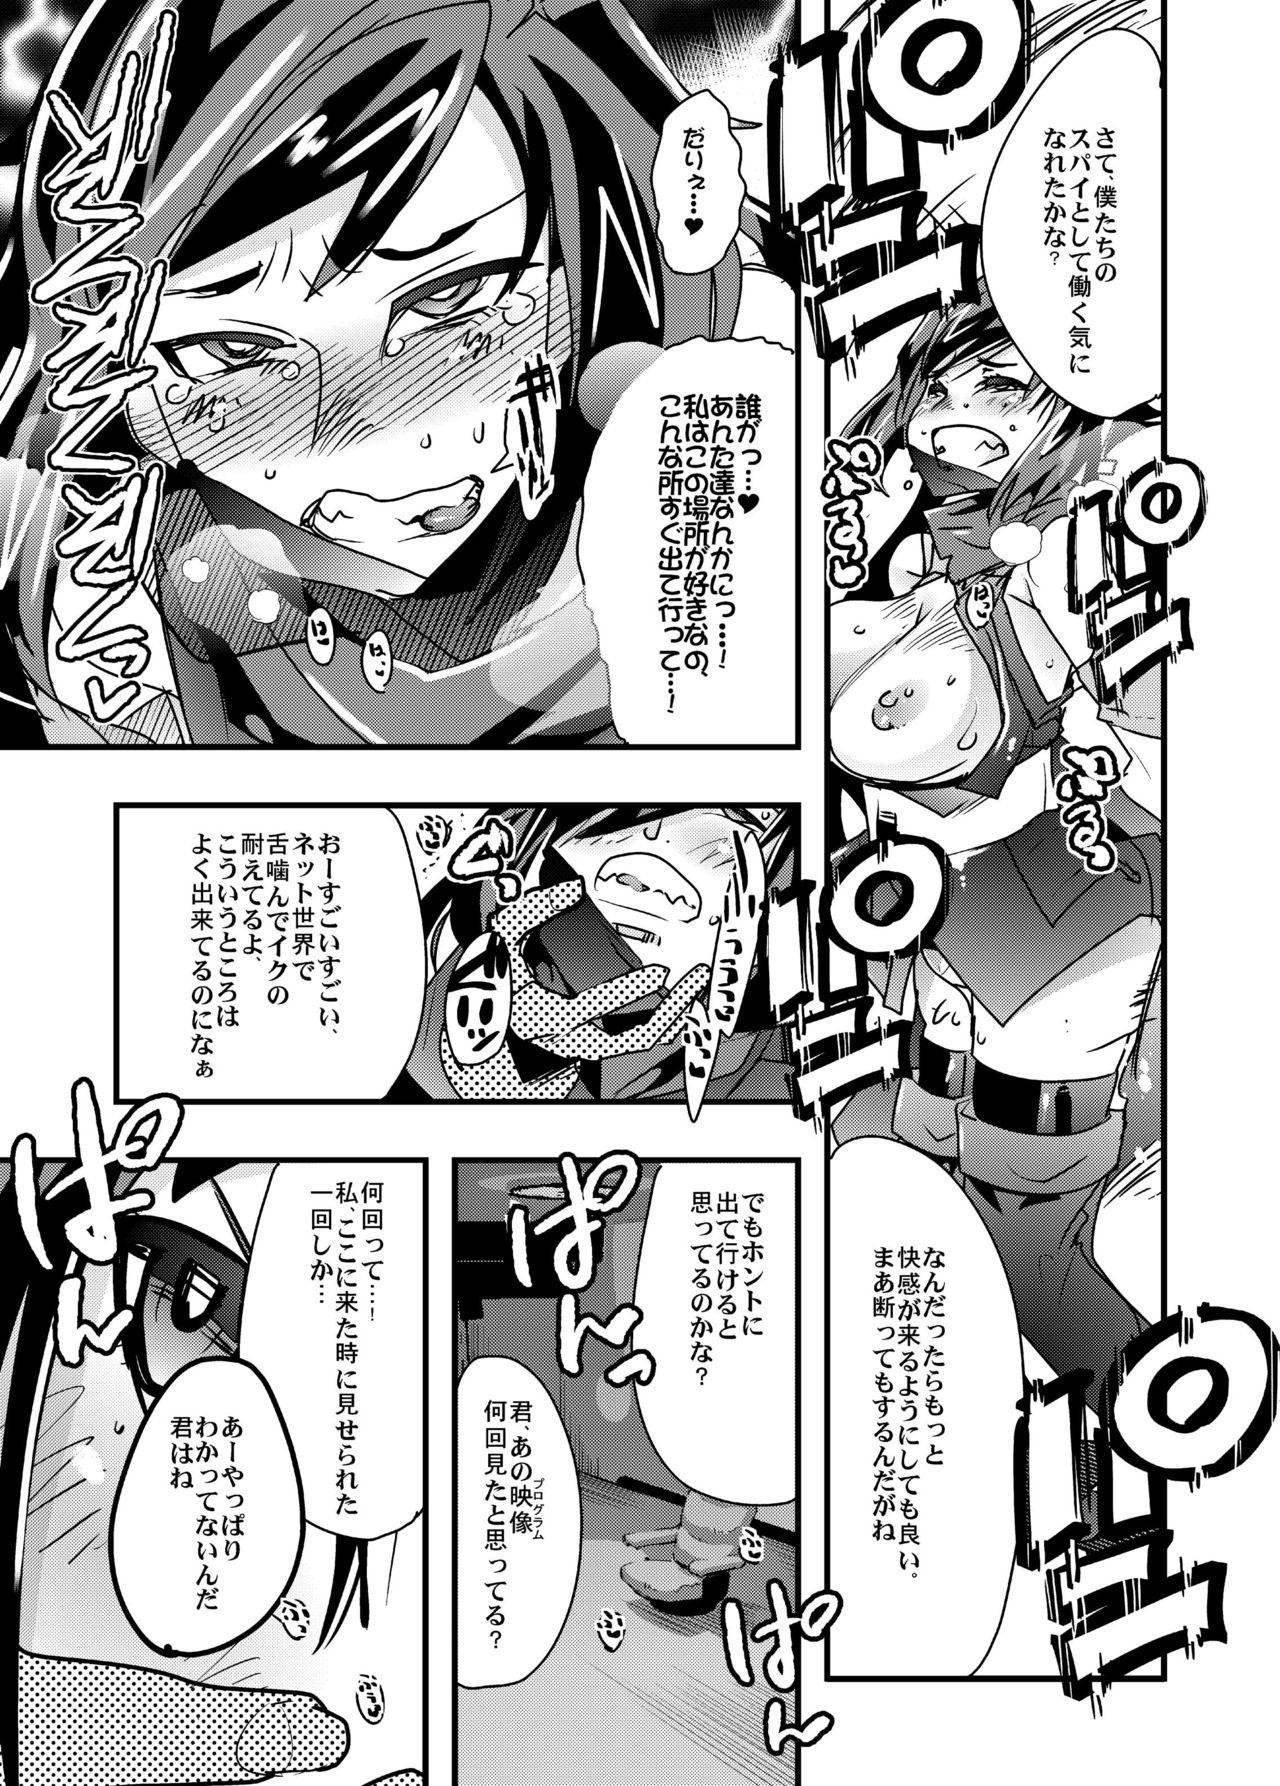 [Bronco Hitoritabi (Uchi-Uchi Keyaki)] Diver-nin Ayame to Ecchi na Mokeiya no Onee-san (Gundam Build Divers) [Digital] 10